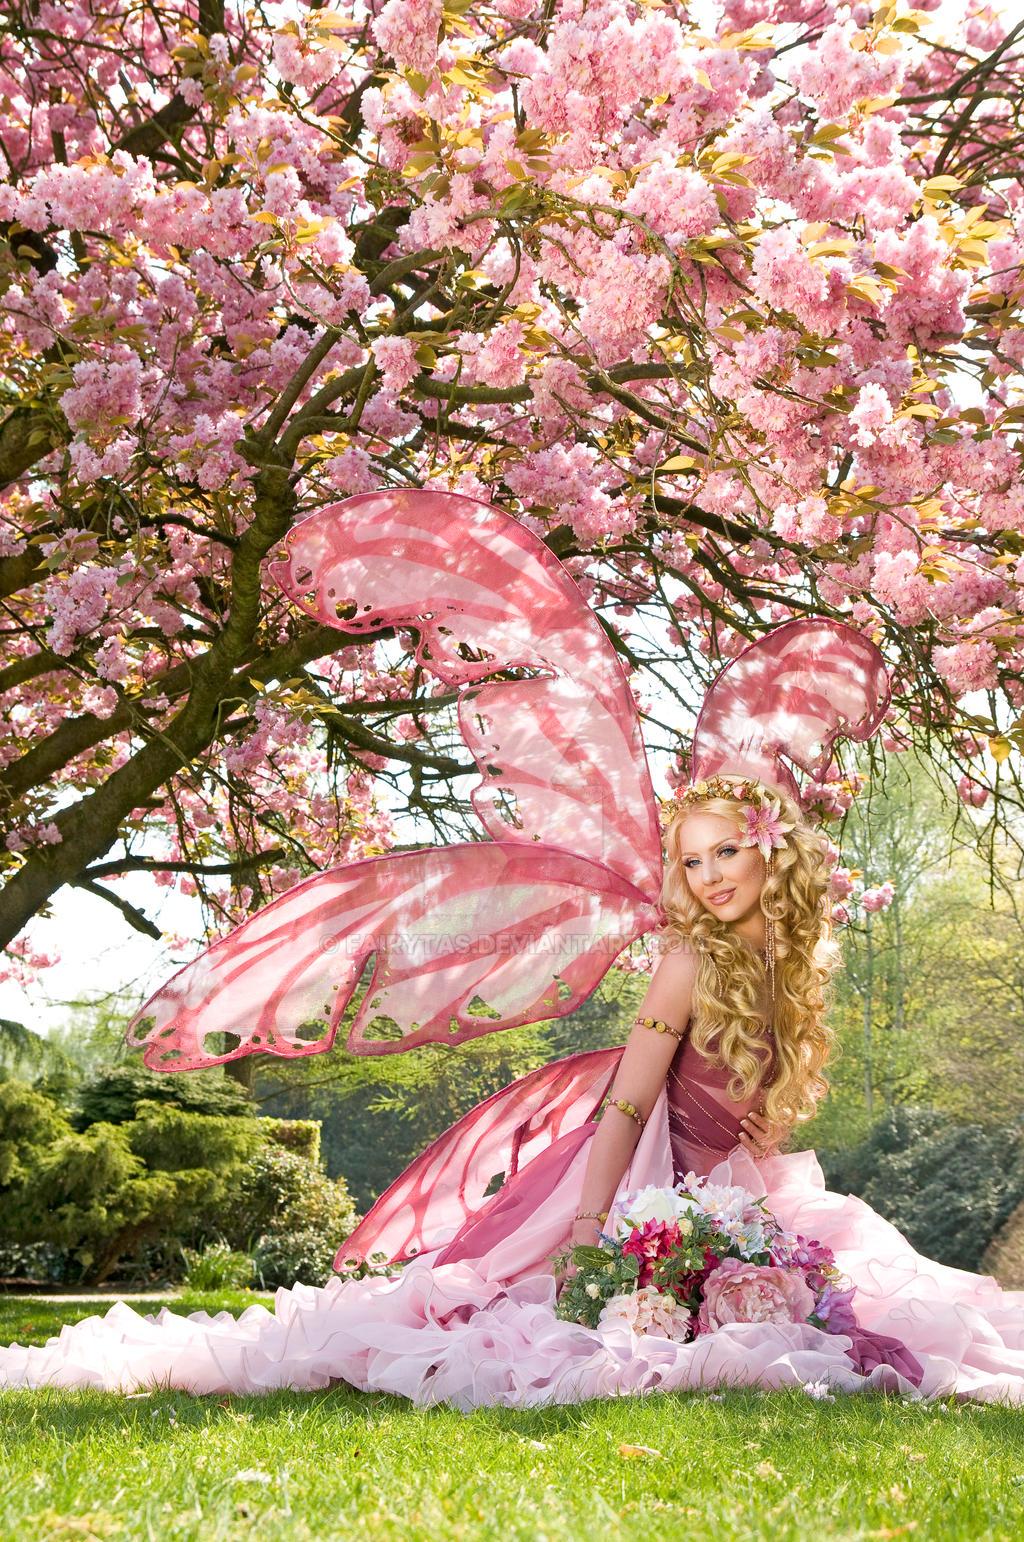 Cherry Blossom by Jolien-Rosanne